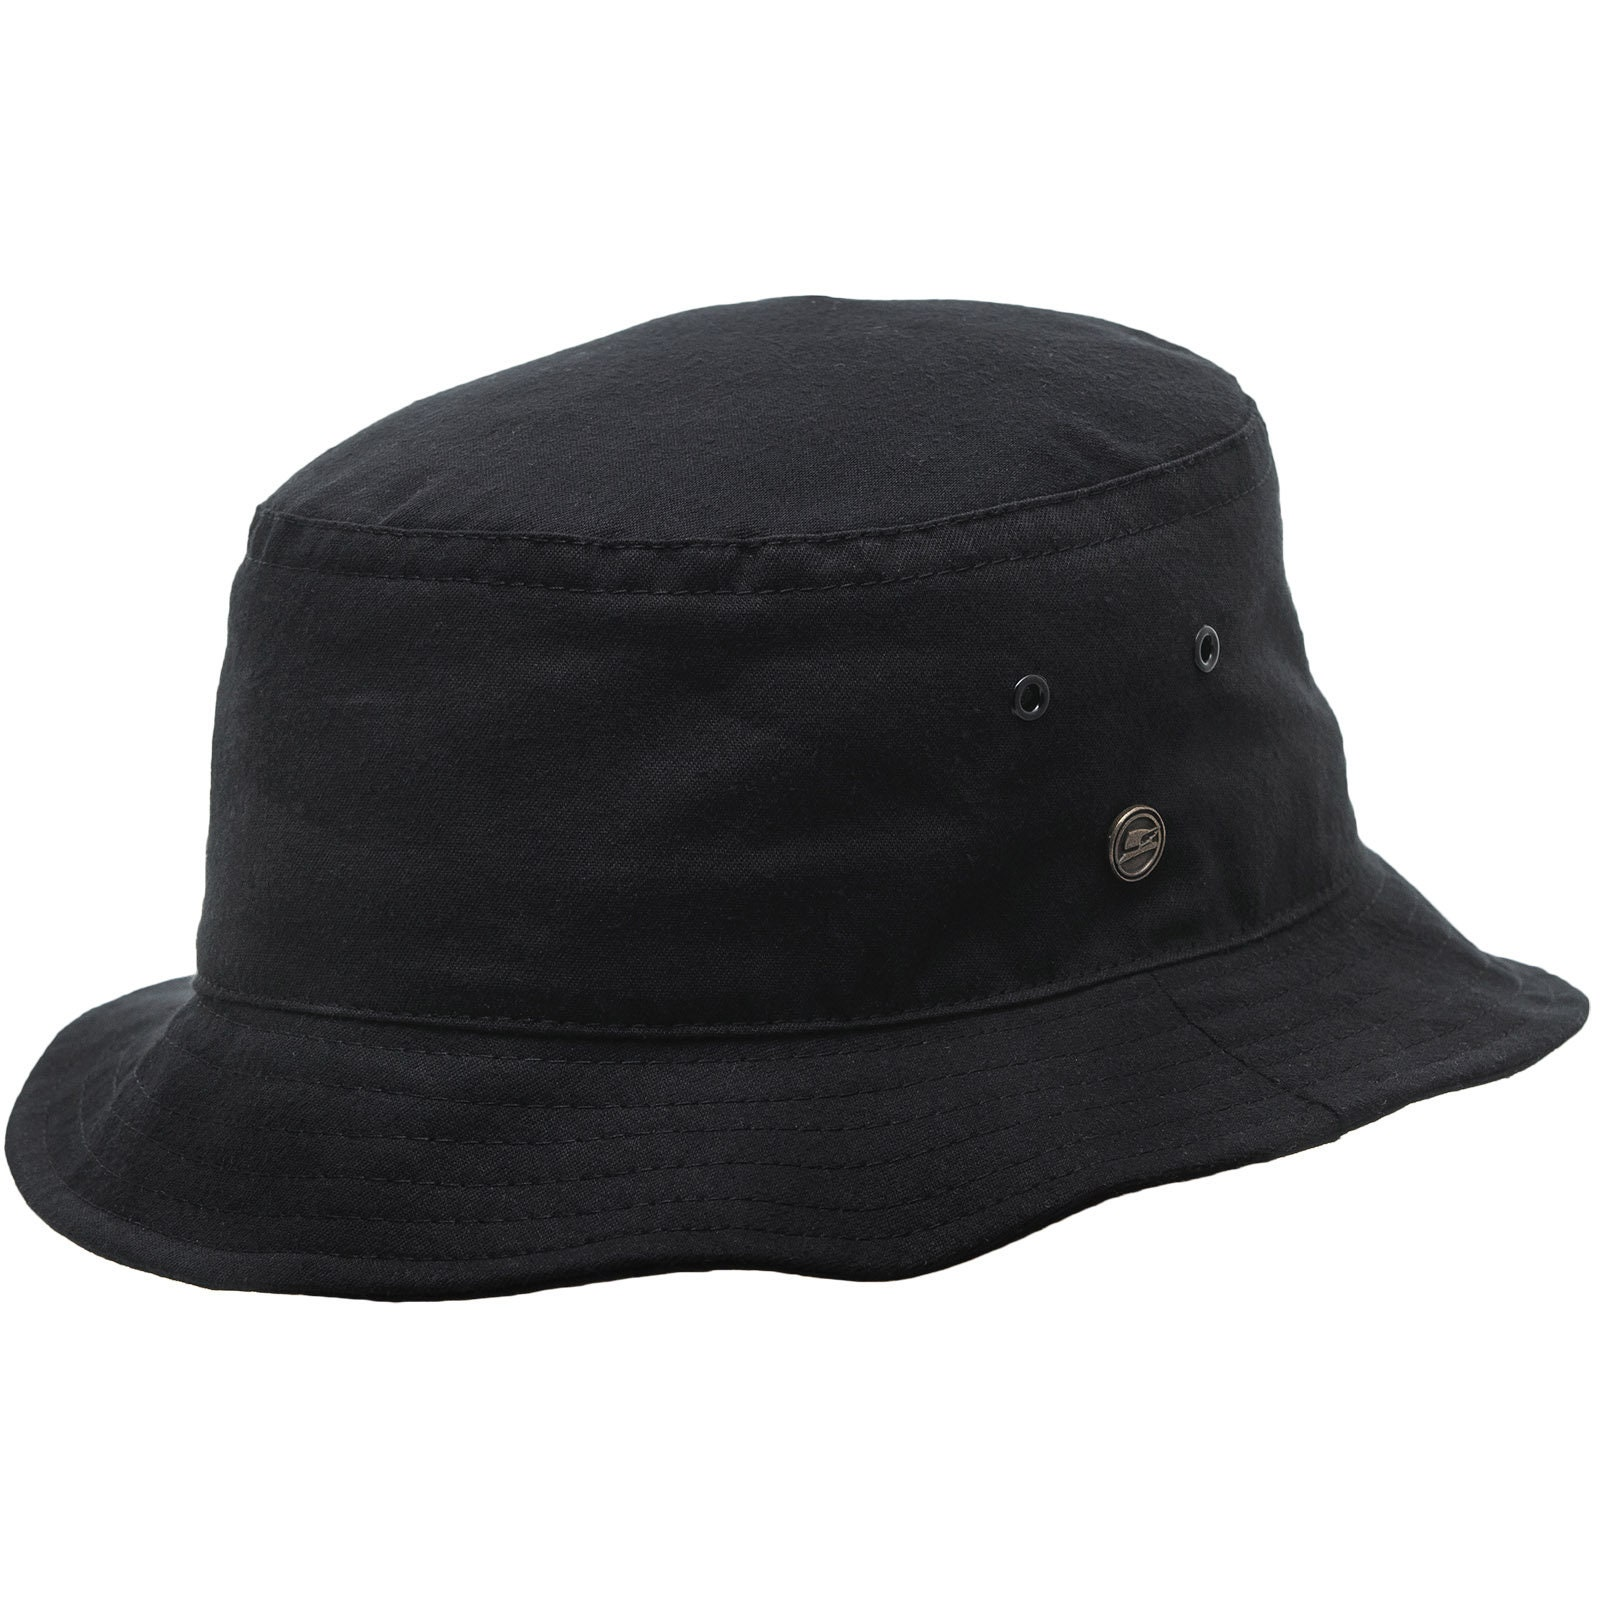 GOLF sombrero piluso pescador de algodón negro  70f8ce5206c